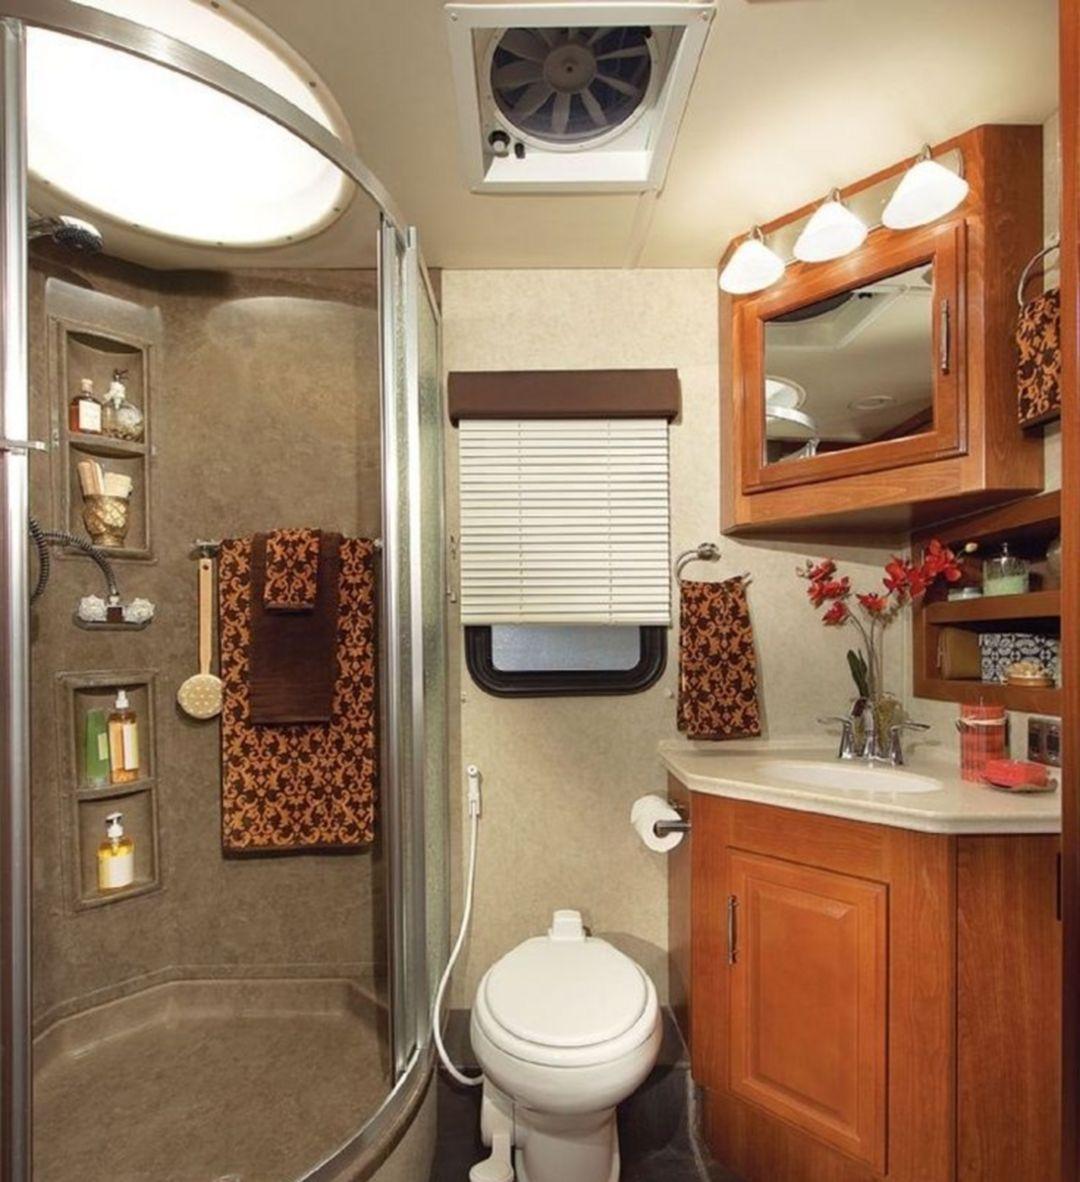 6 Extraordinary RV Camper Interior Makeover Ideas For Fun Journey